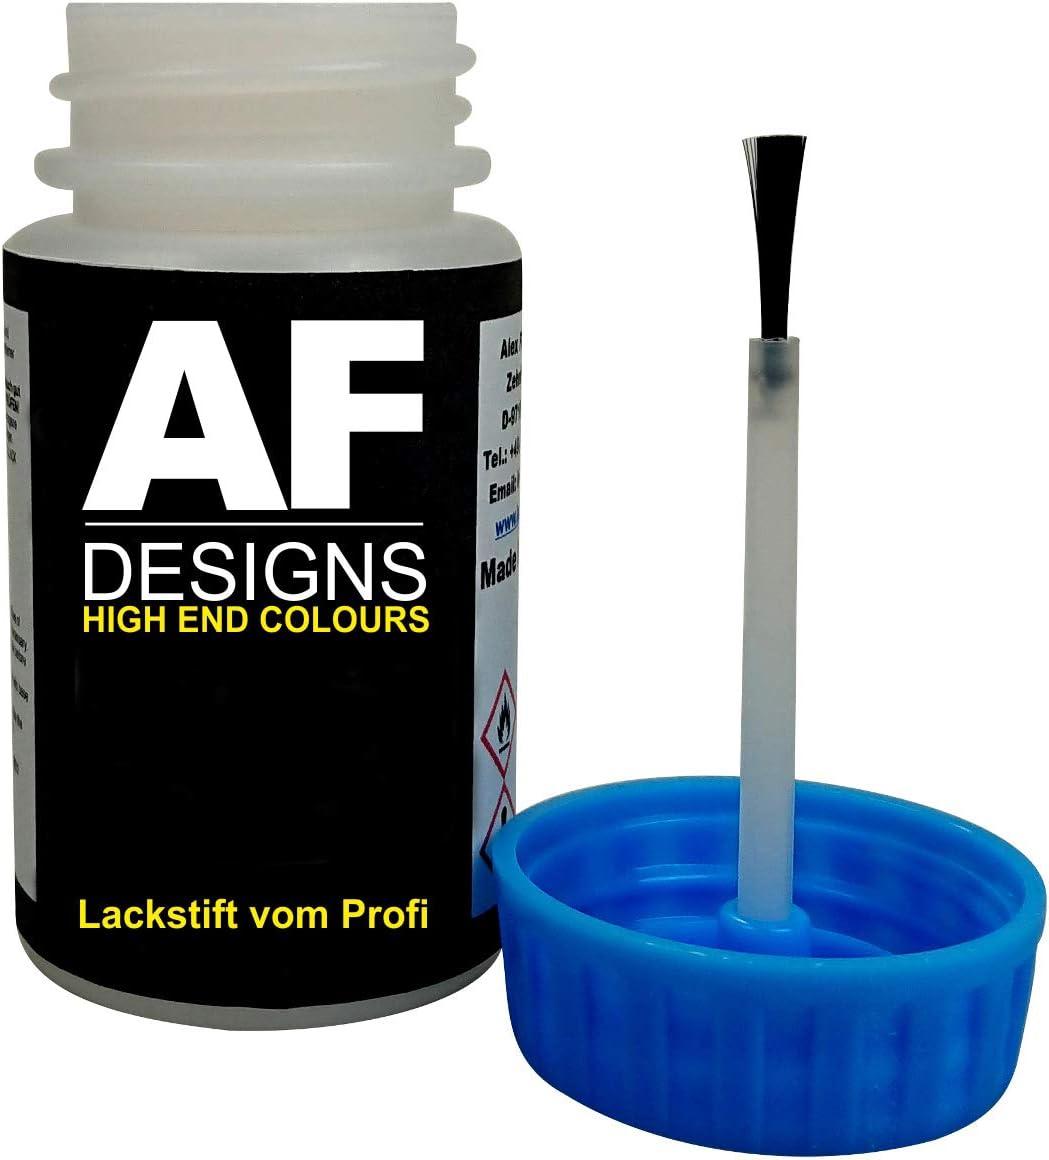 Alex Flittner Designs Lackstift Ral 7016 Anthrazitgrau Matt 50ml Schnelltrocknend Acryl Auto